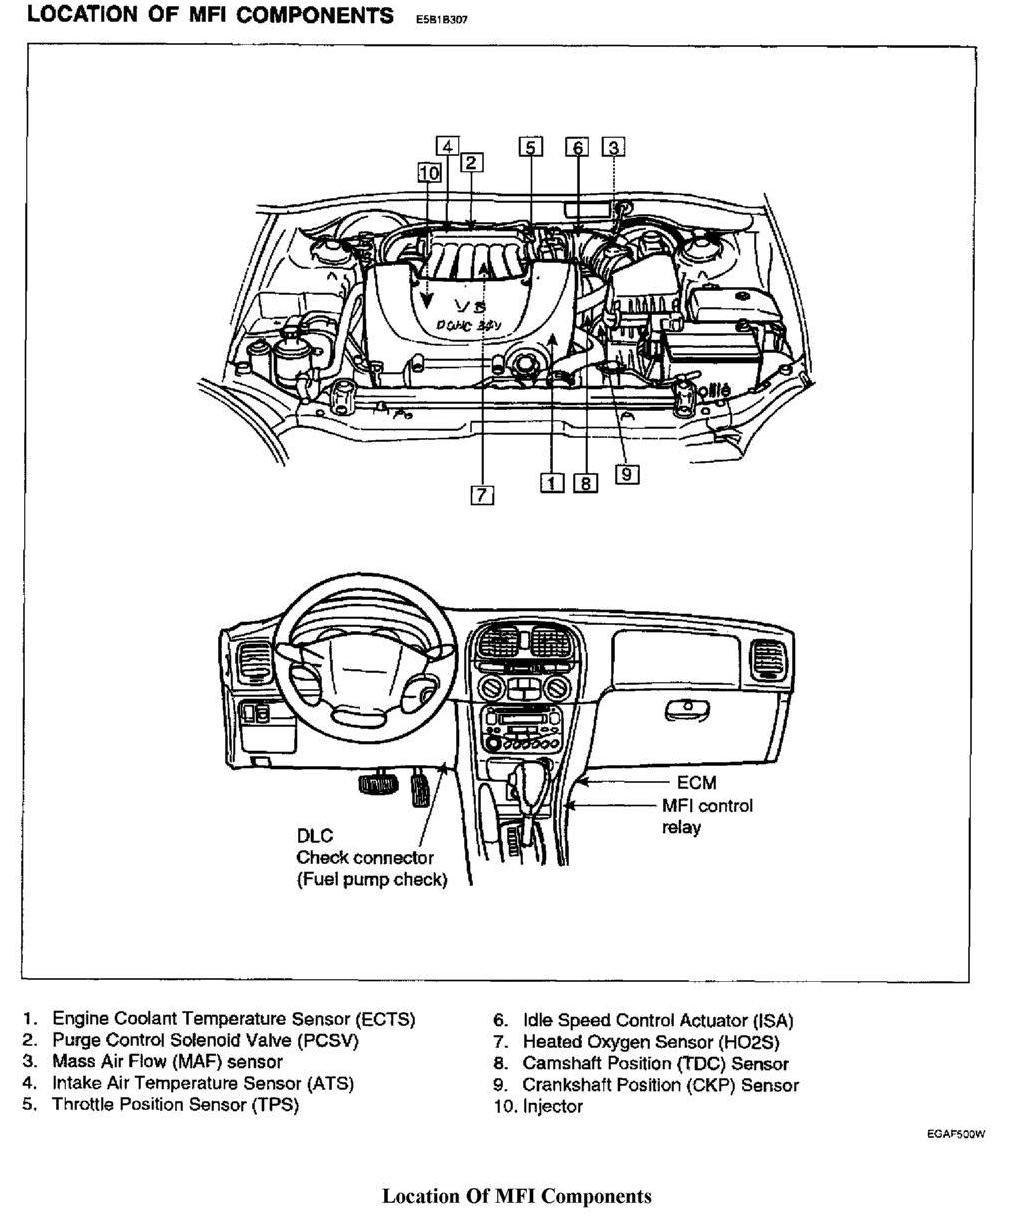 Hyundai Sonata Electrical Schematic